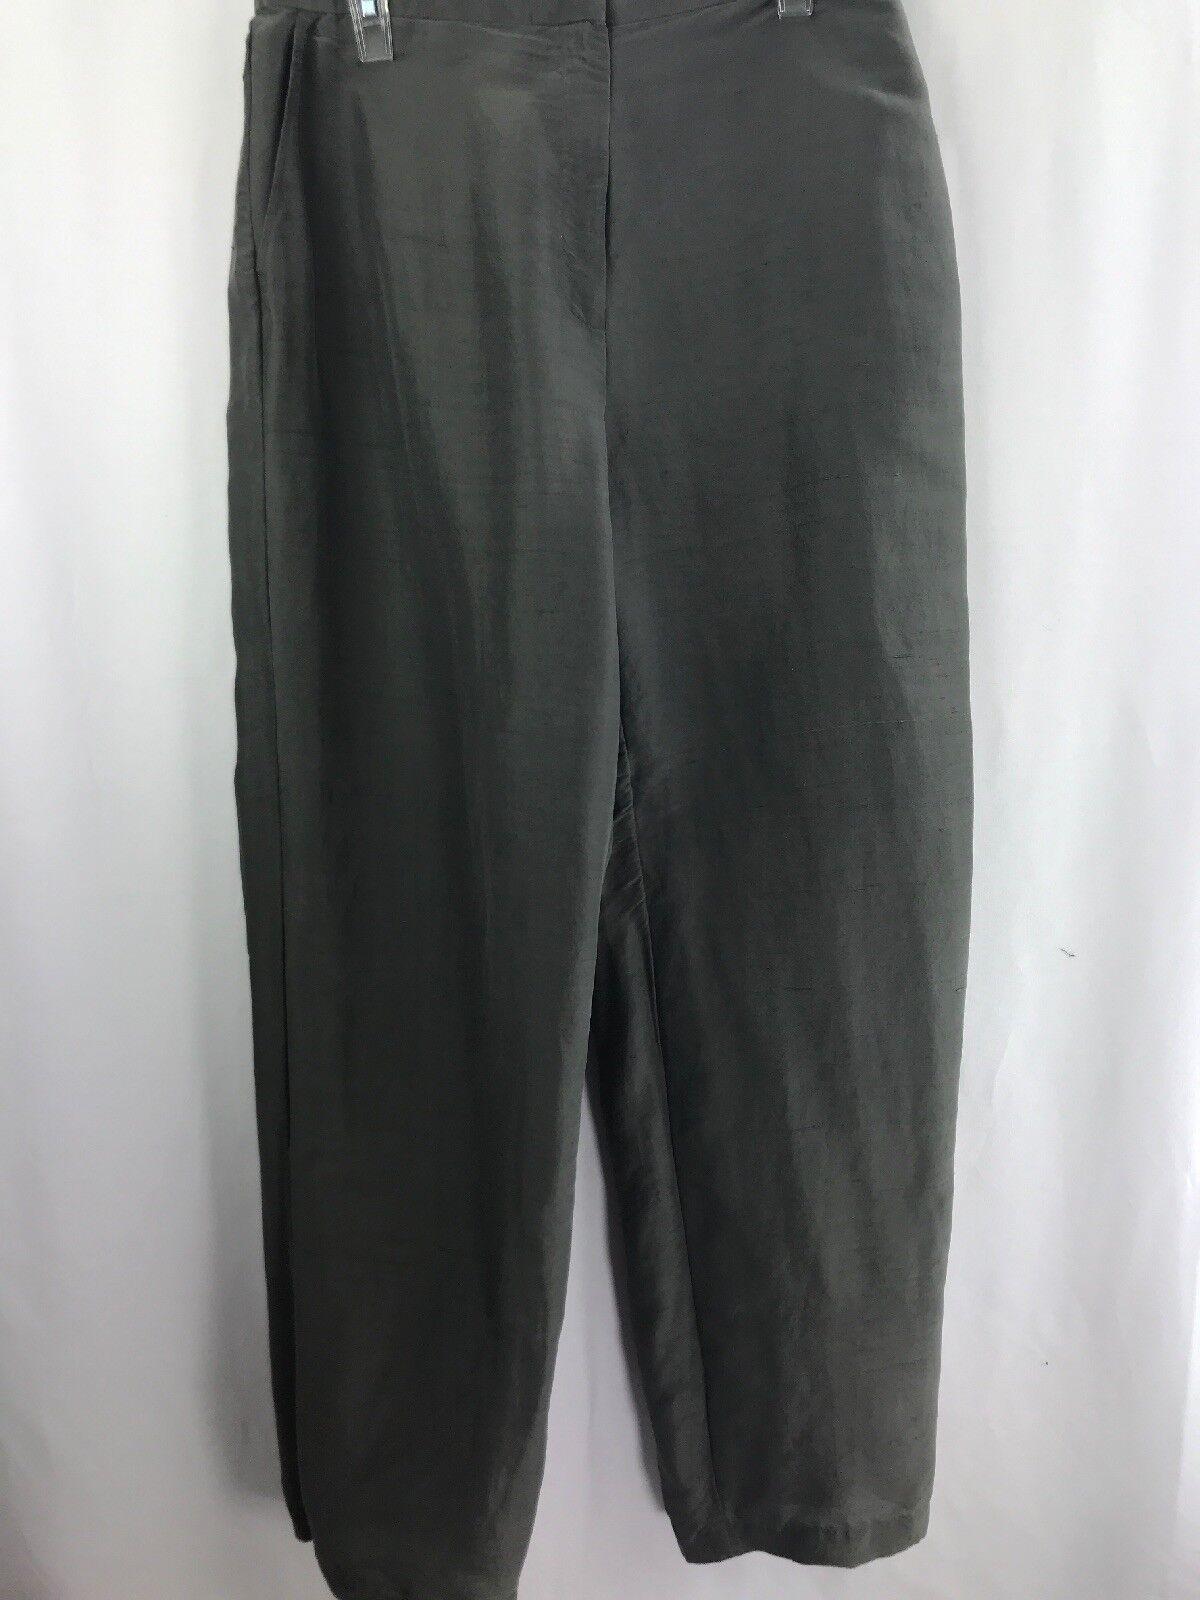 Eileen Fisher Women's Olive Green Business Casual Pants 100% Silk Sz L